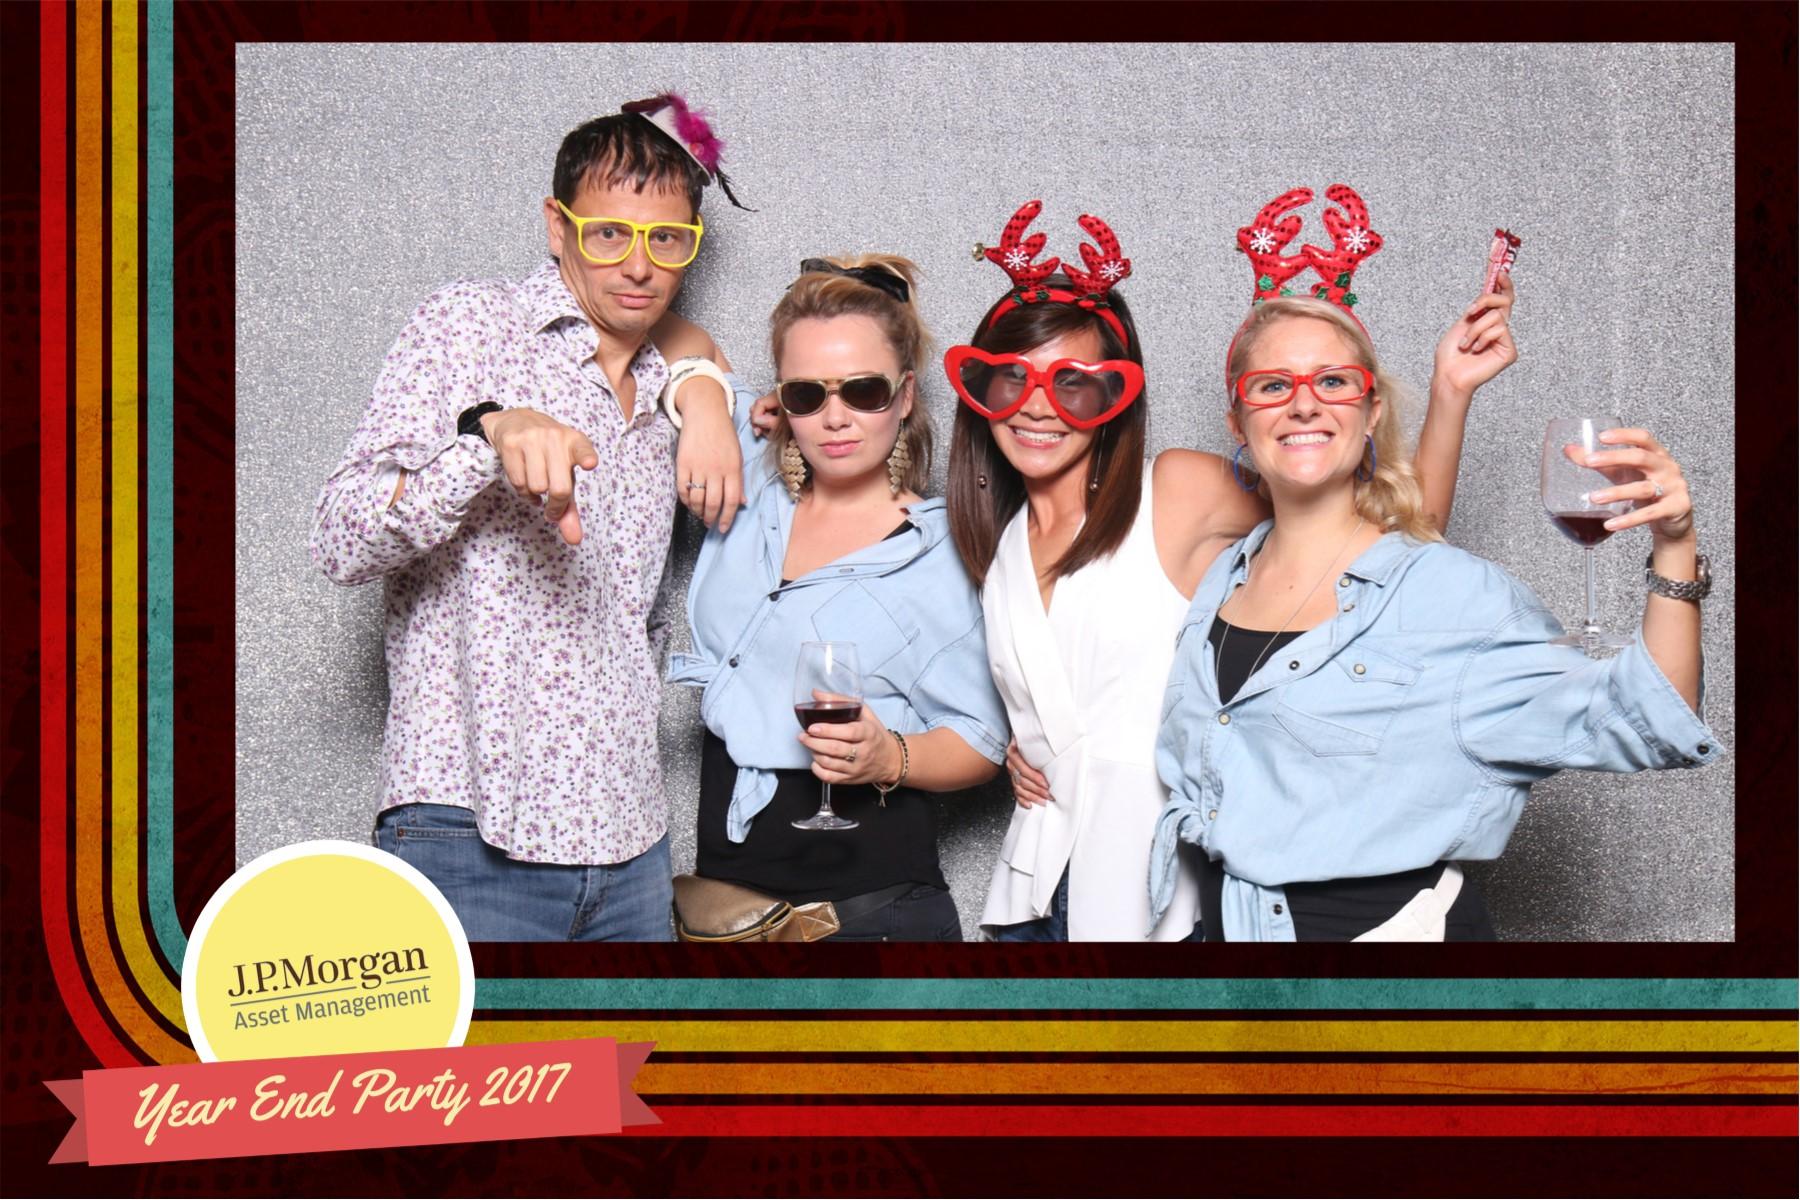 20171208 JP Morgan Year End Party